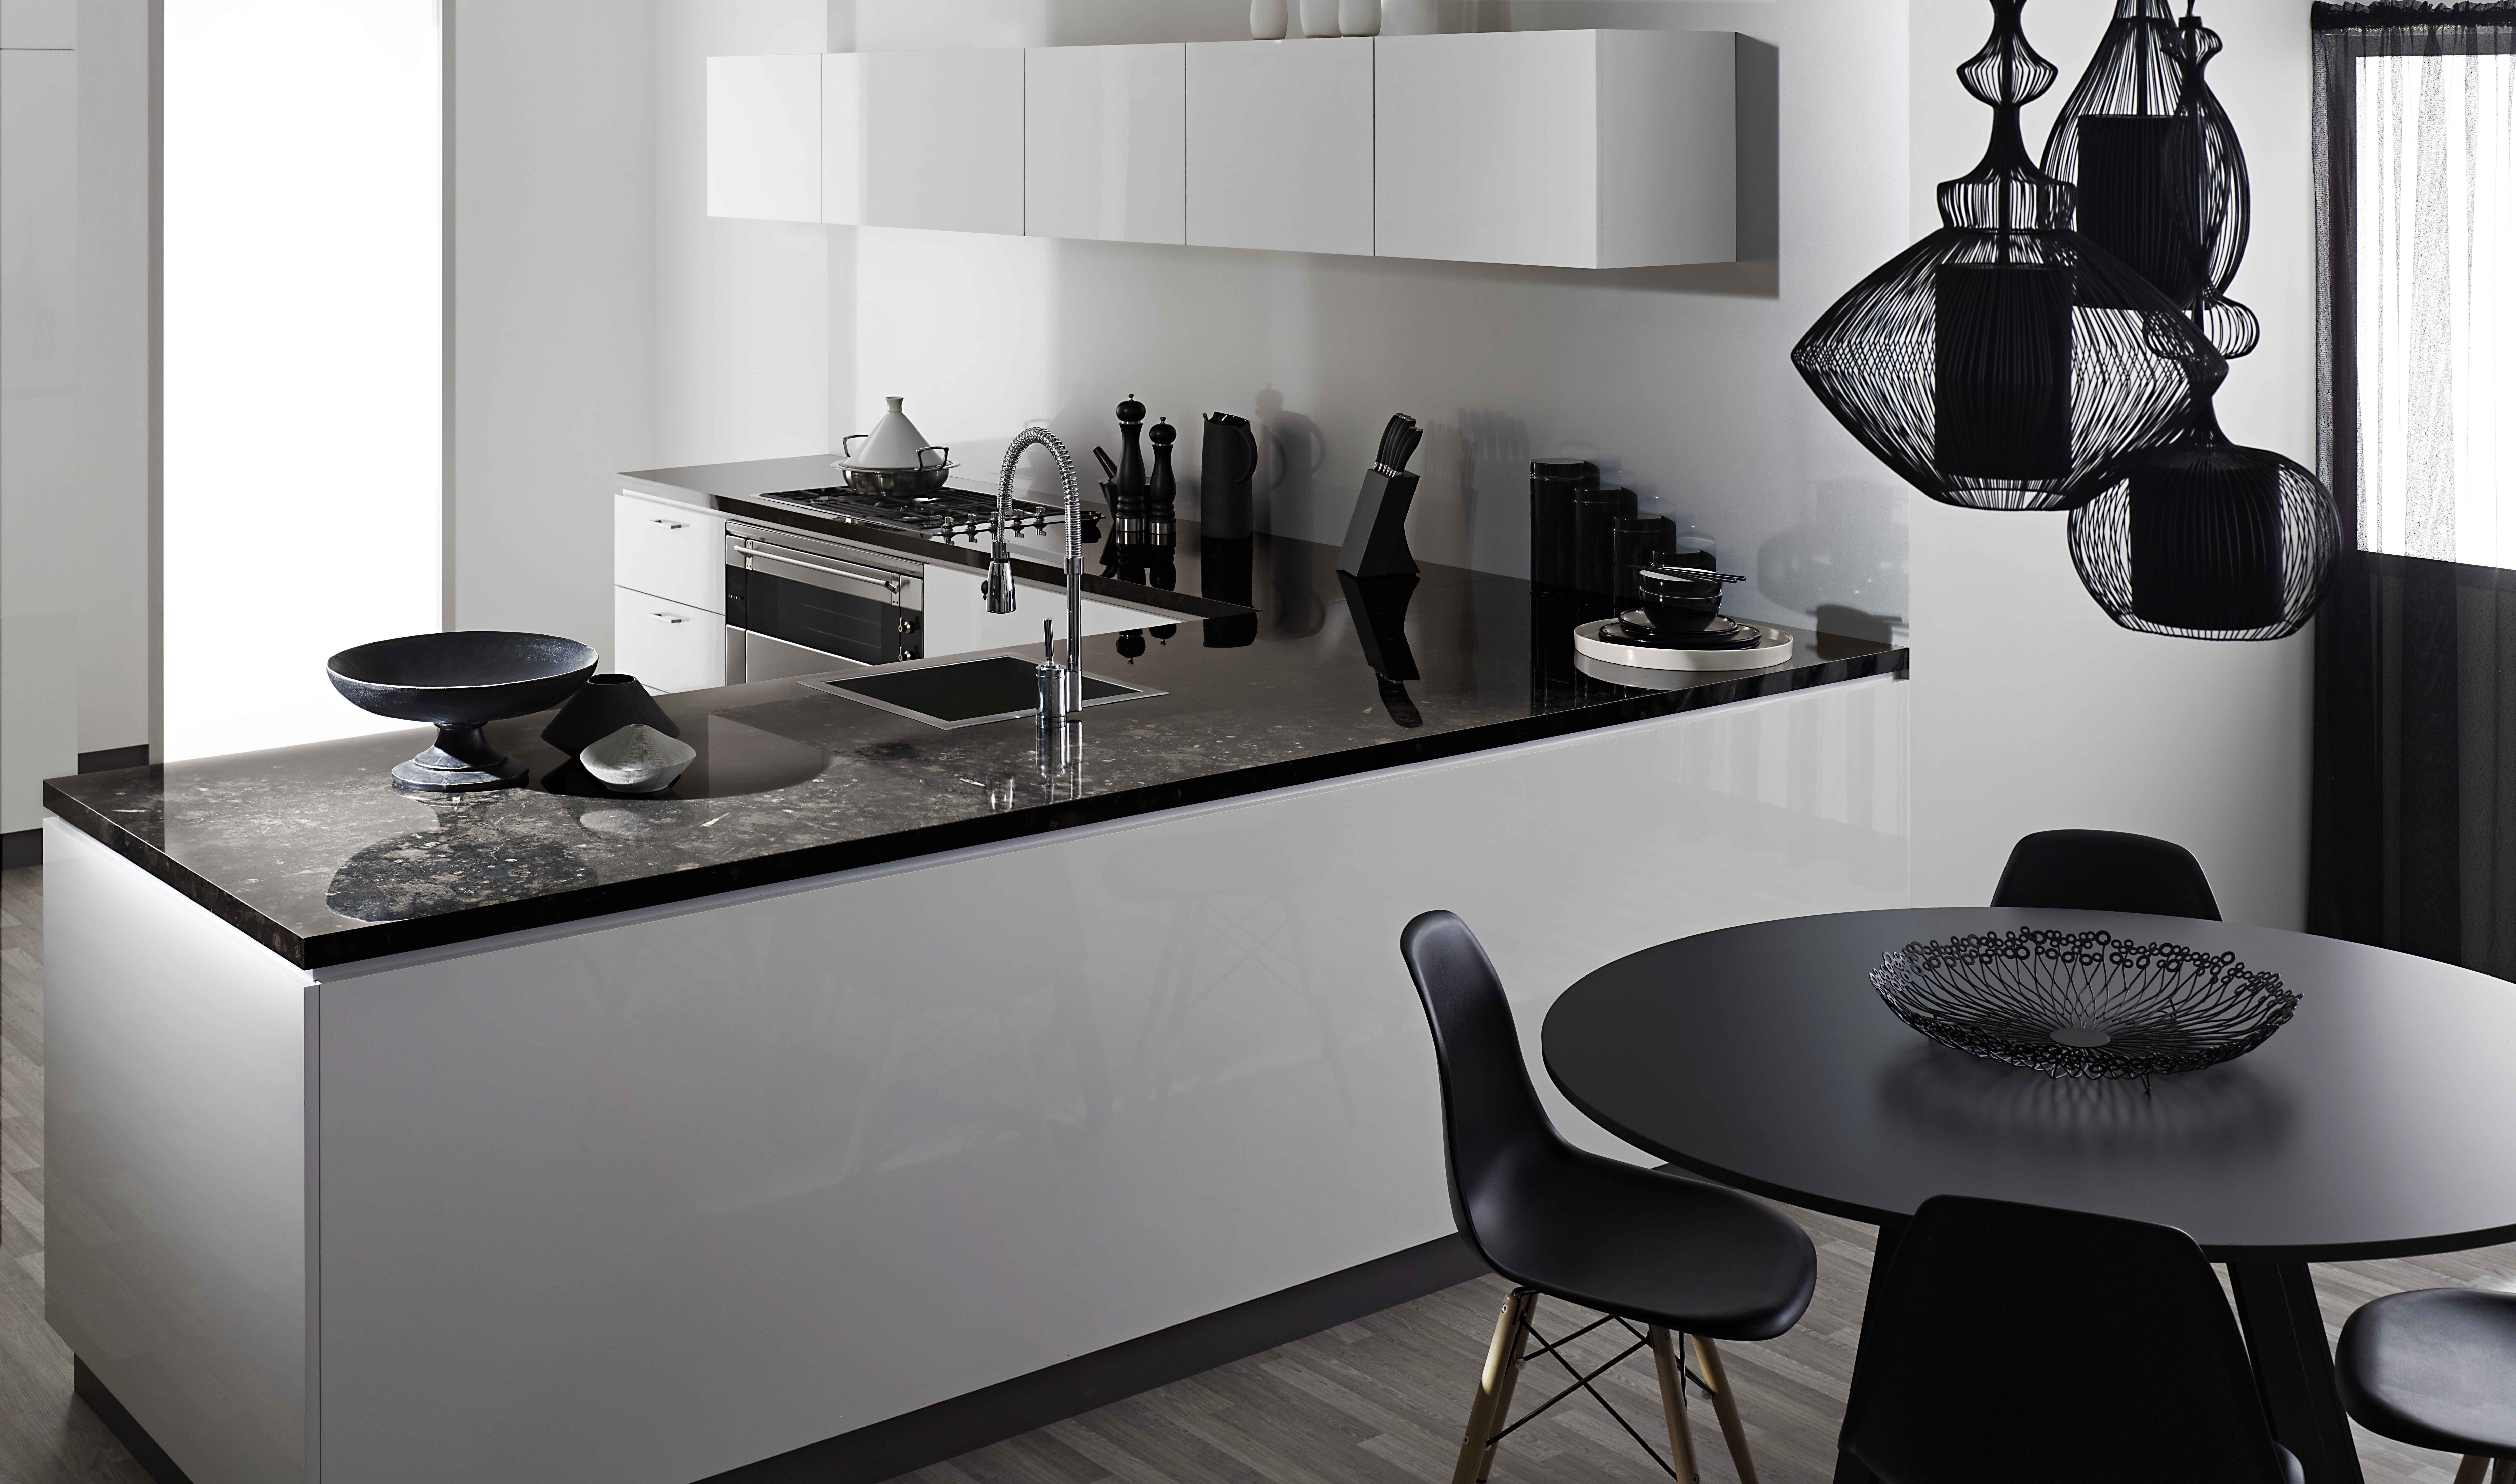 White Kitchen Black Benchtop benchtop laminex 180fx black fossilstone diamondgloss finish